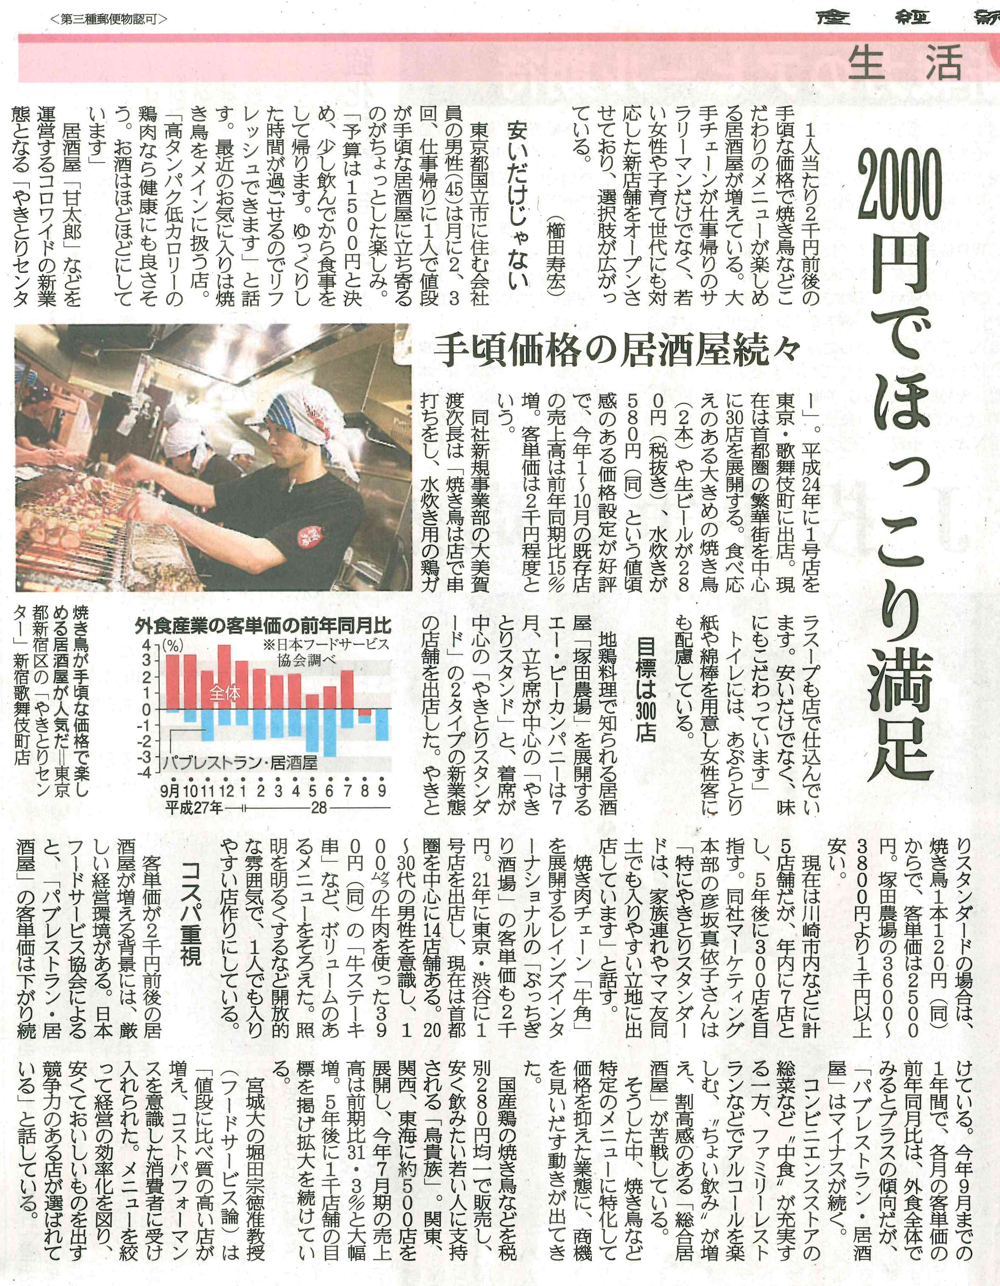 http://www.apcompany.jp/media/2016/11/14/yakitori_sankei.png